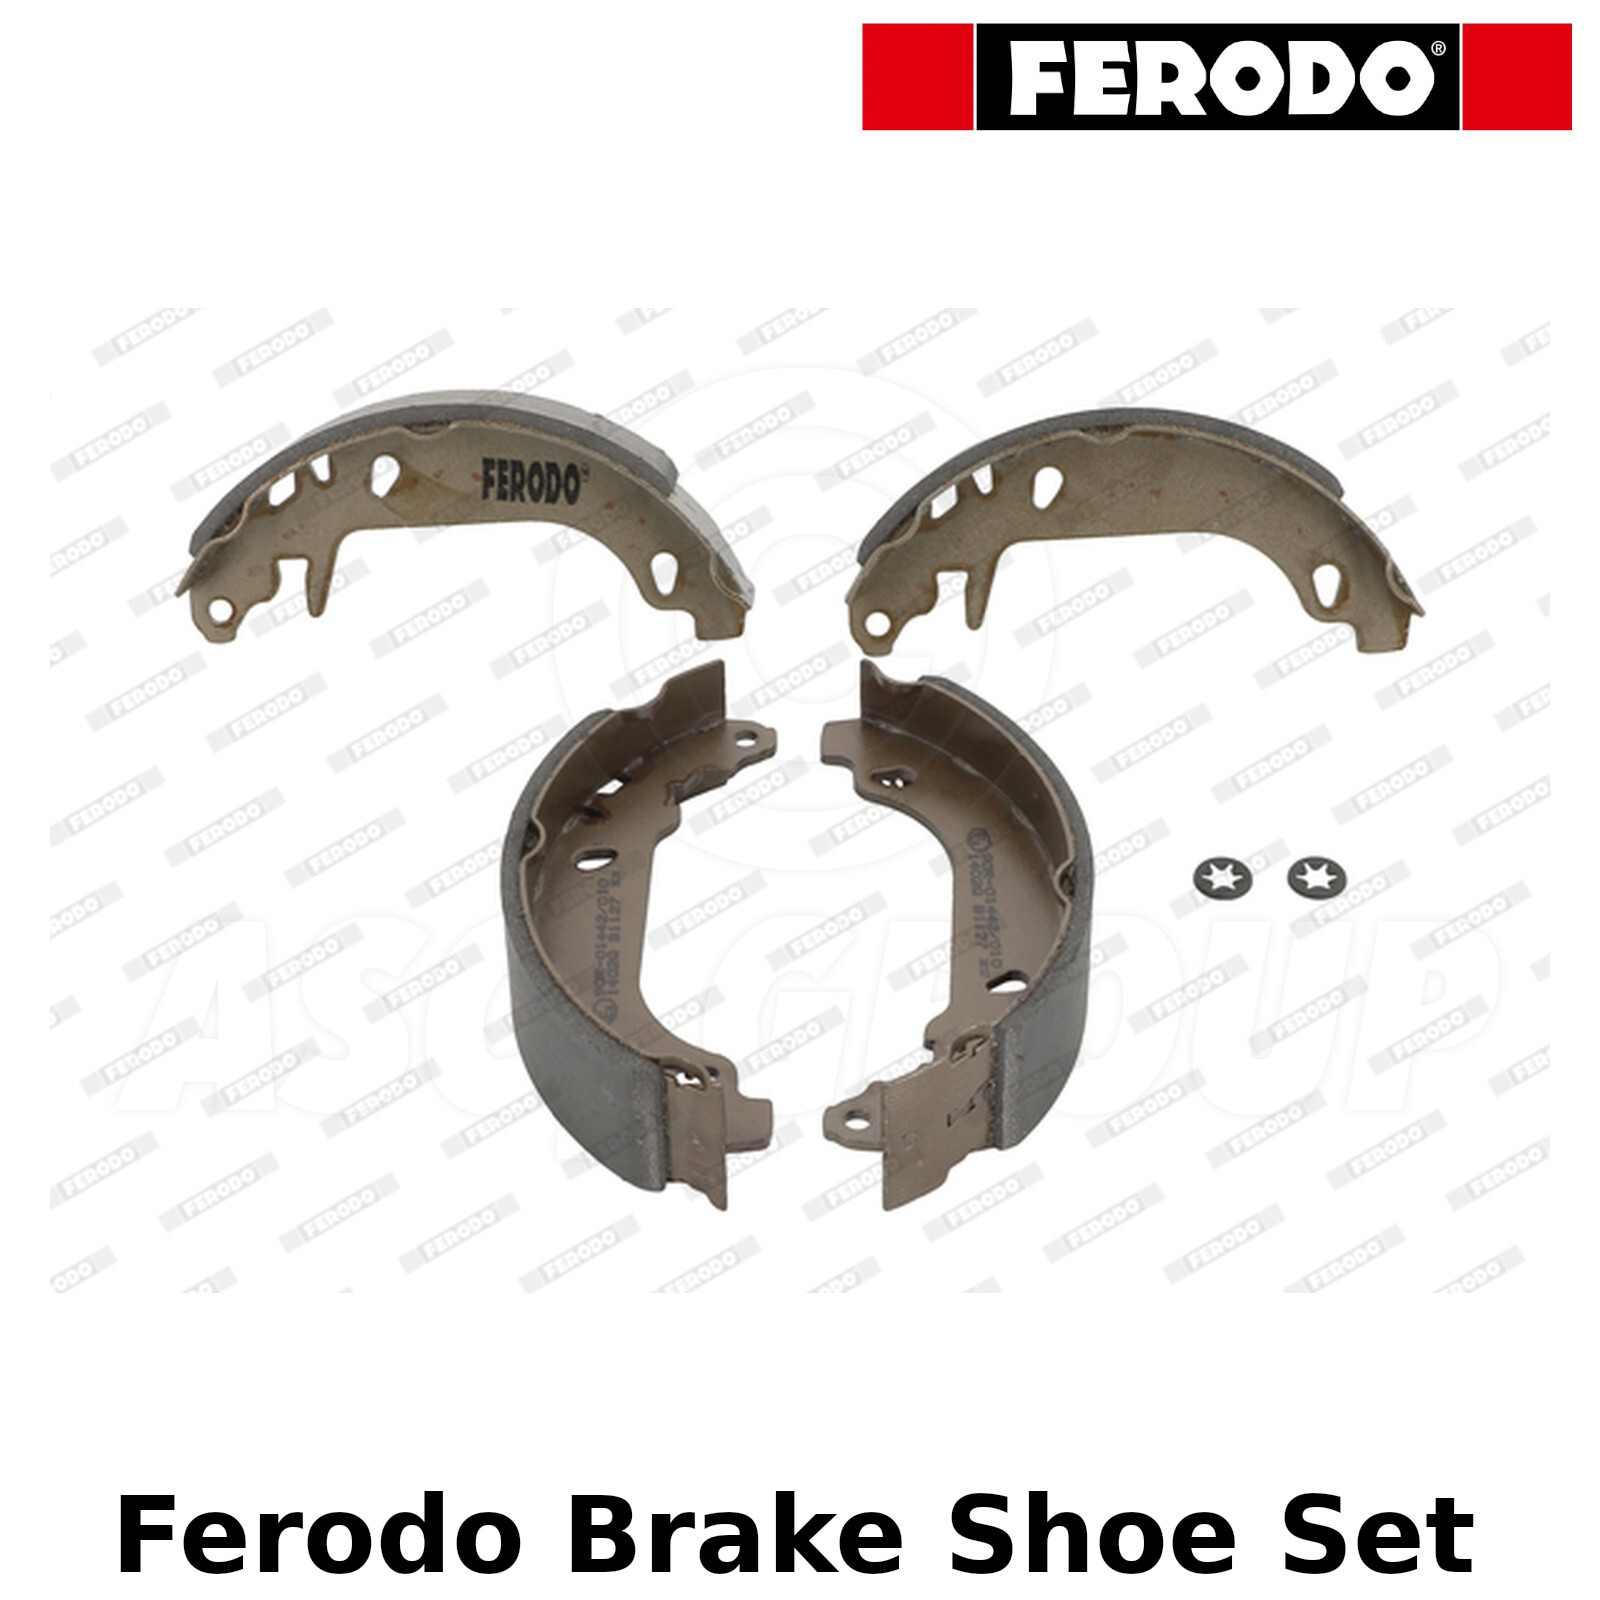 RENAULT Brake Shoes Rear Set 7701202820 7701202661 7701202542 7701949780 Quality